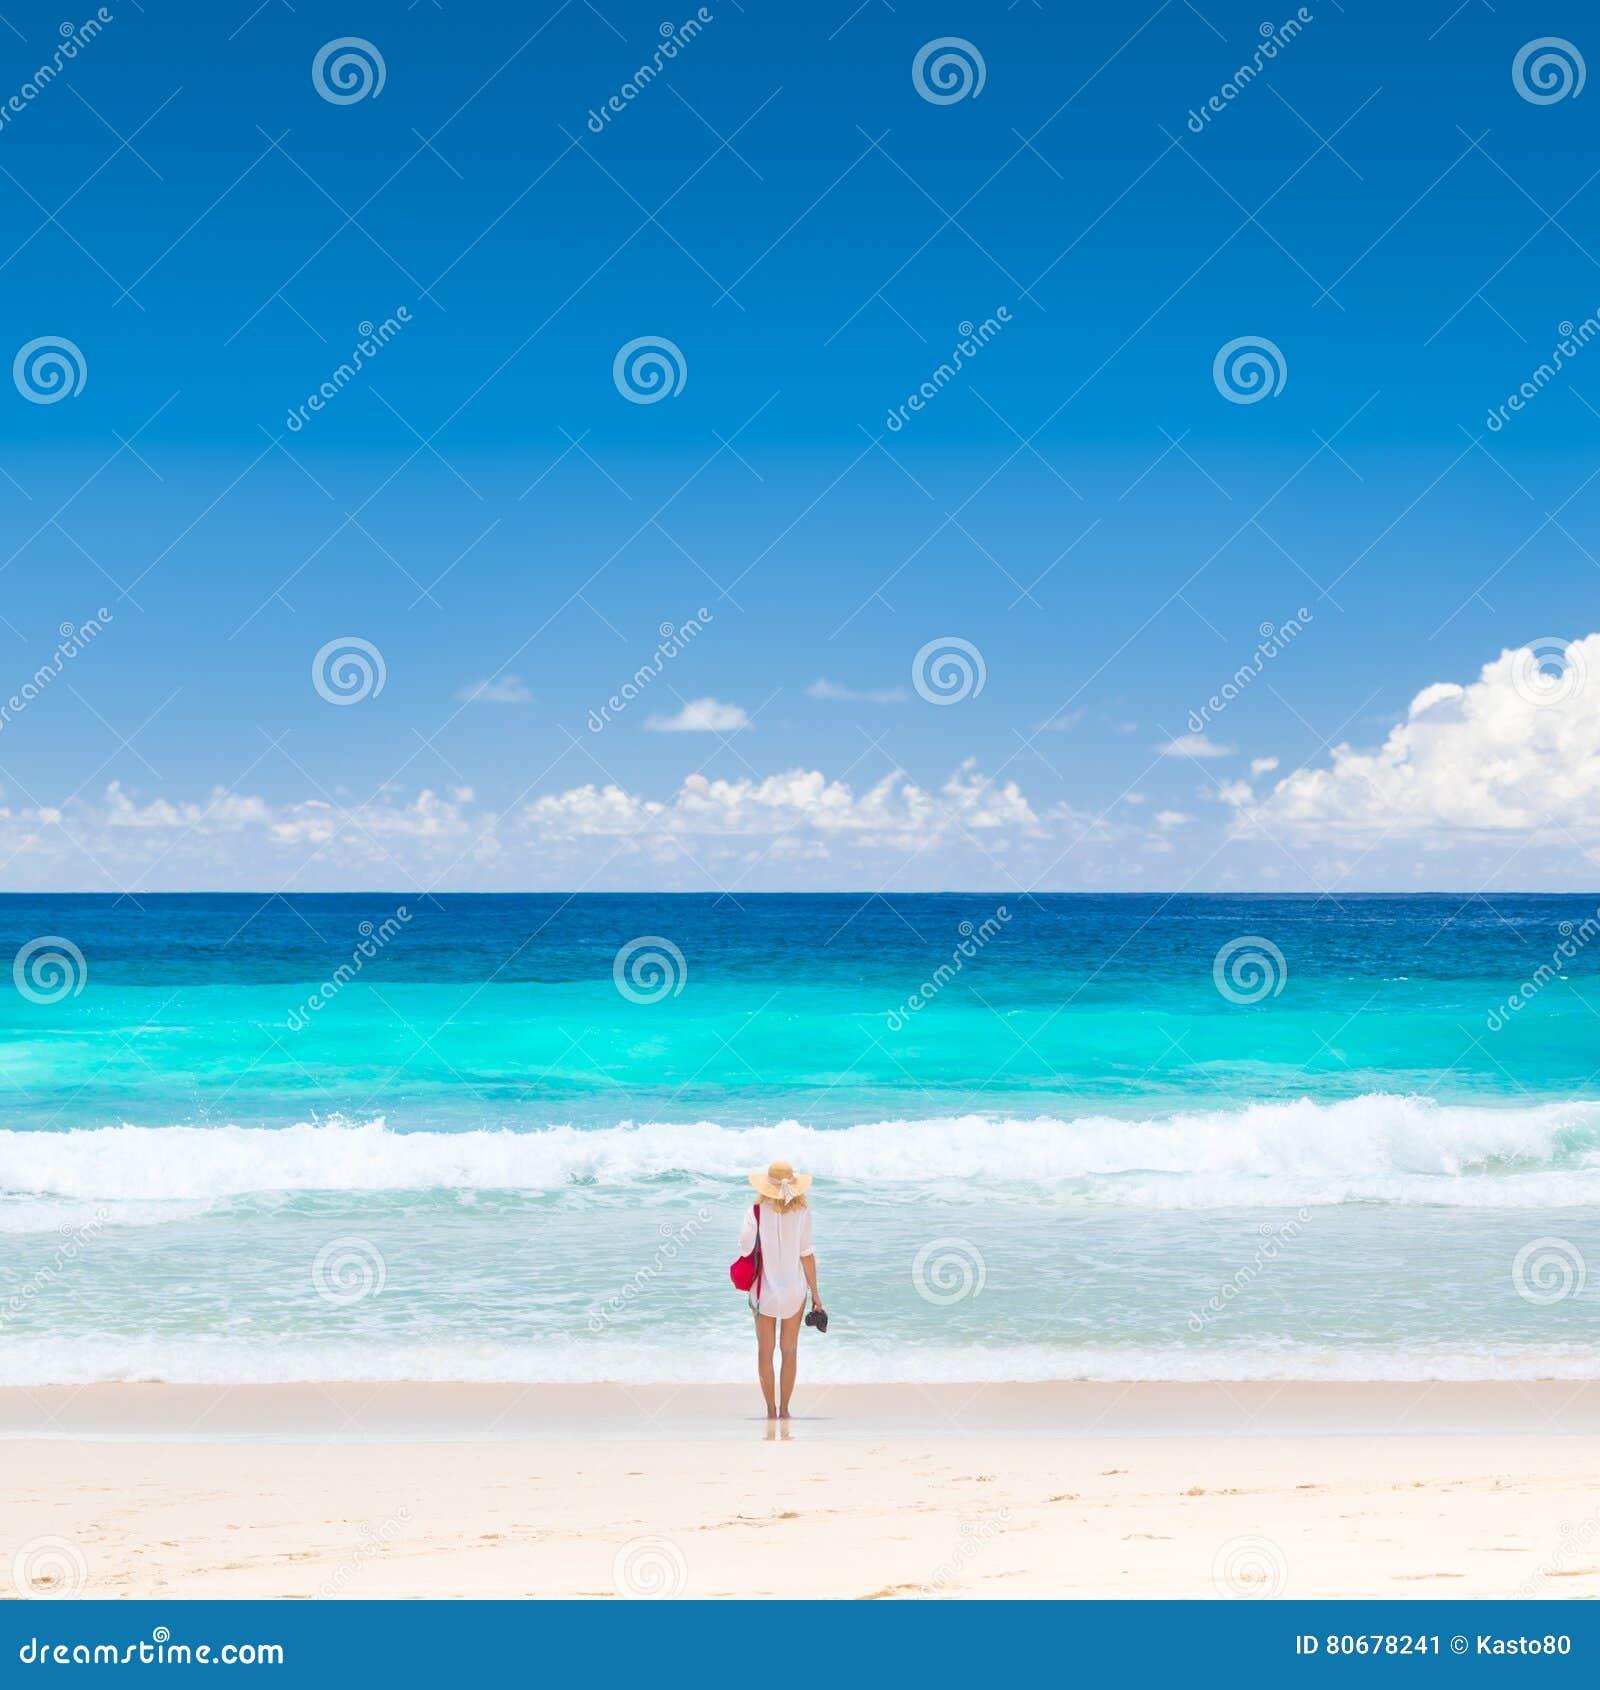 Woman Enjoying At Beach Stock Image Image Of Pleasure: Woman Enjoying Picture Perfect Beach On Mahe Island